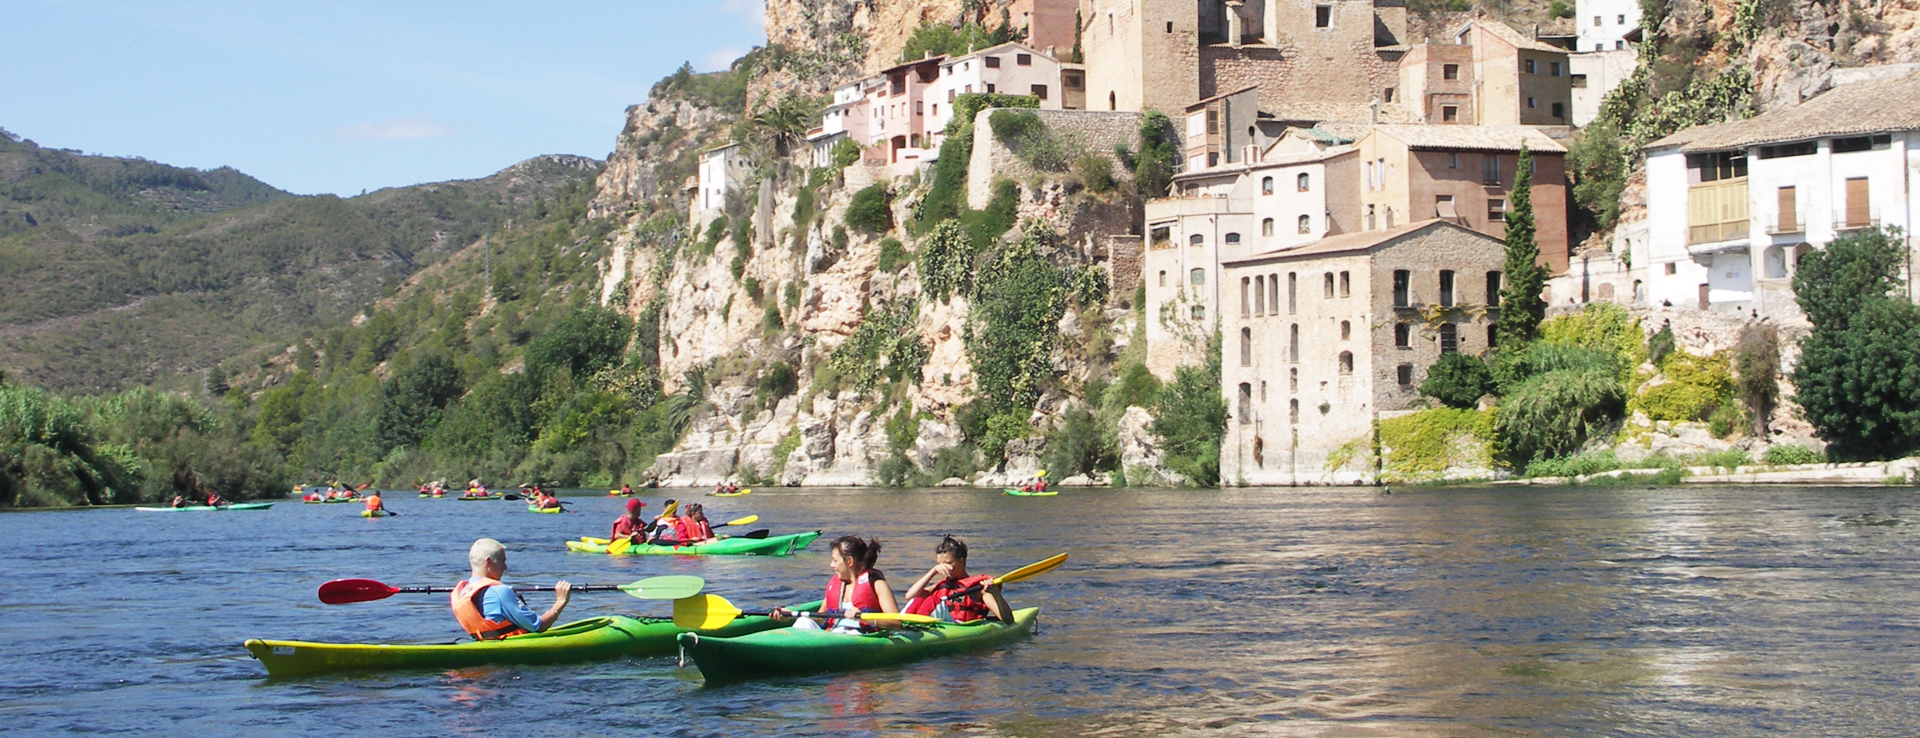 Cursos de Kayak o canoa en el Delta del Ebro